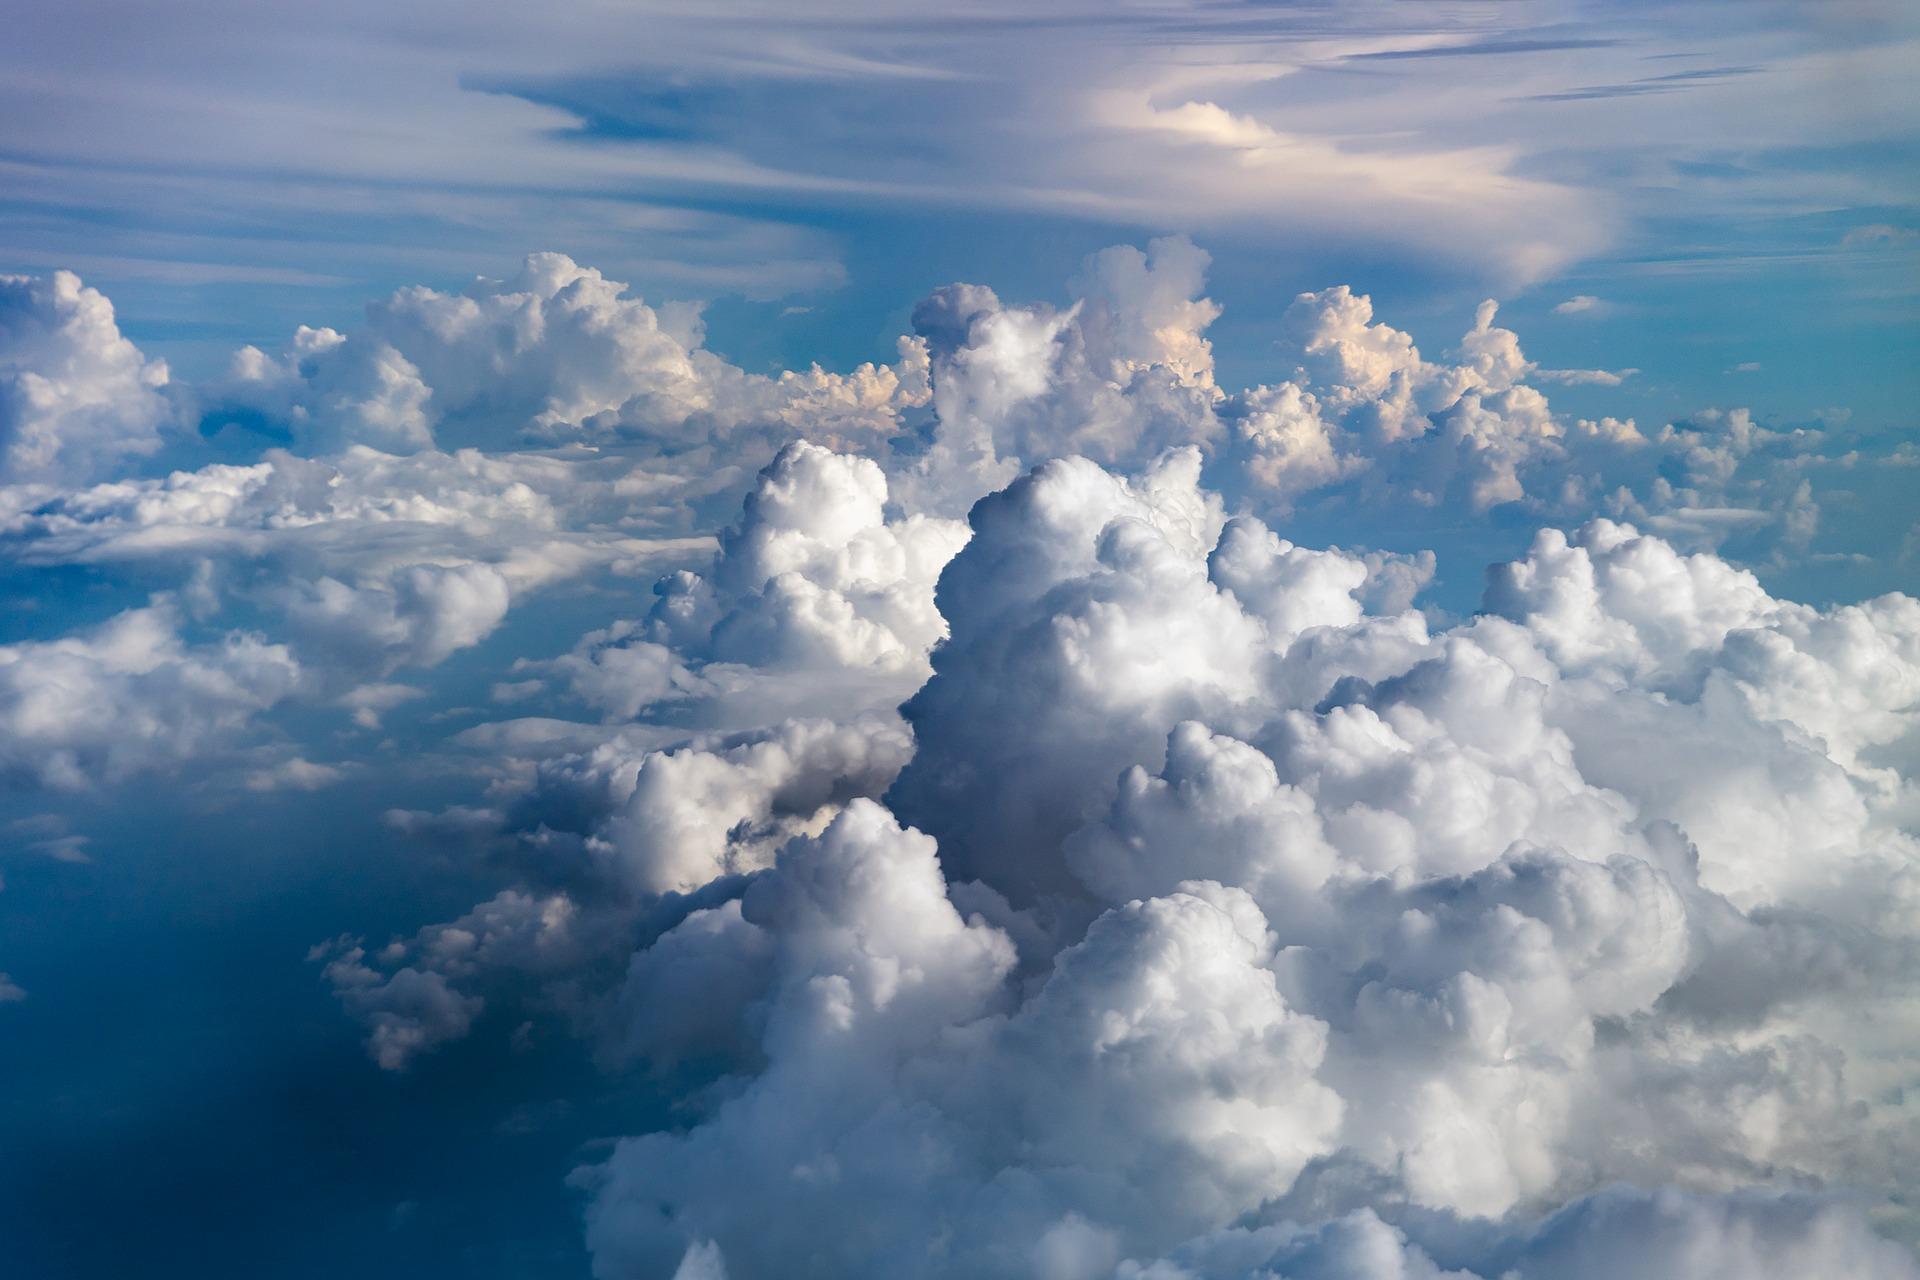 clouds-2085112_1920.jpg